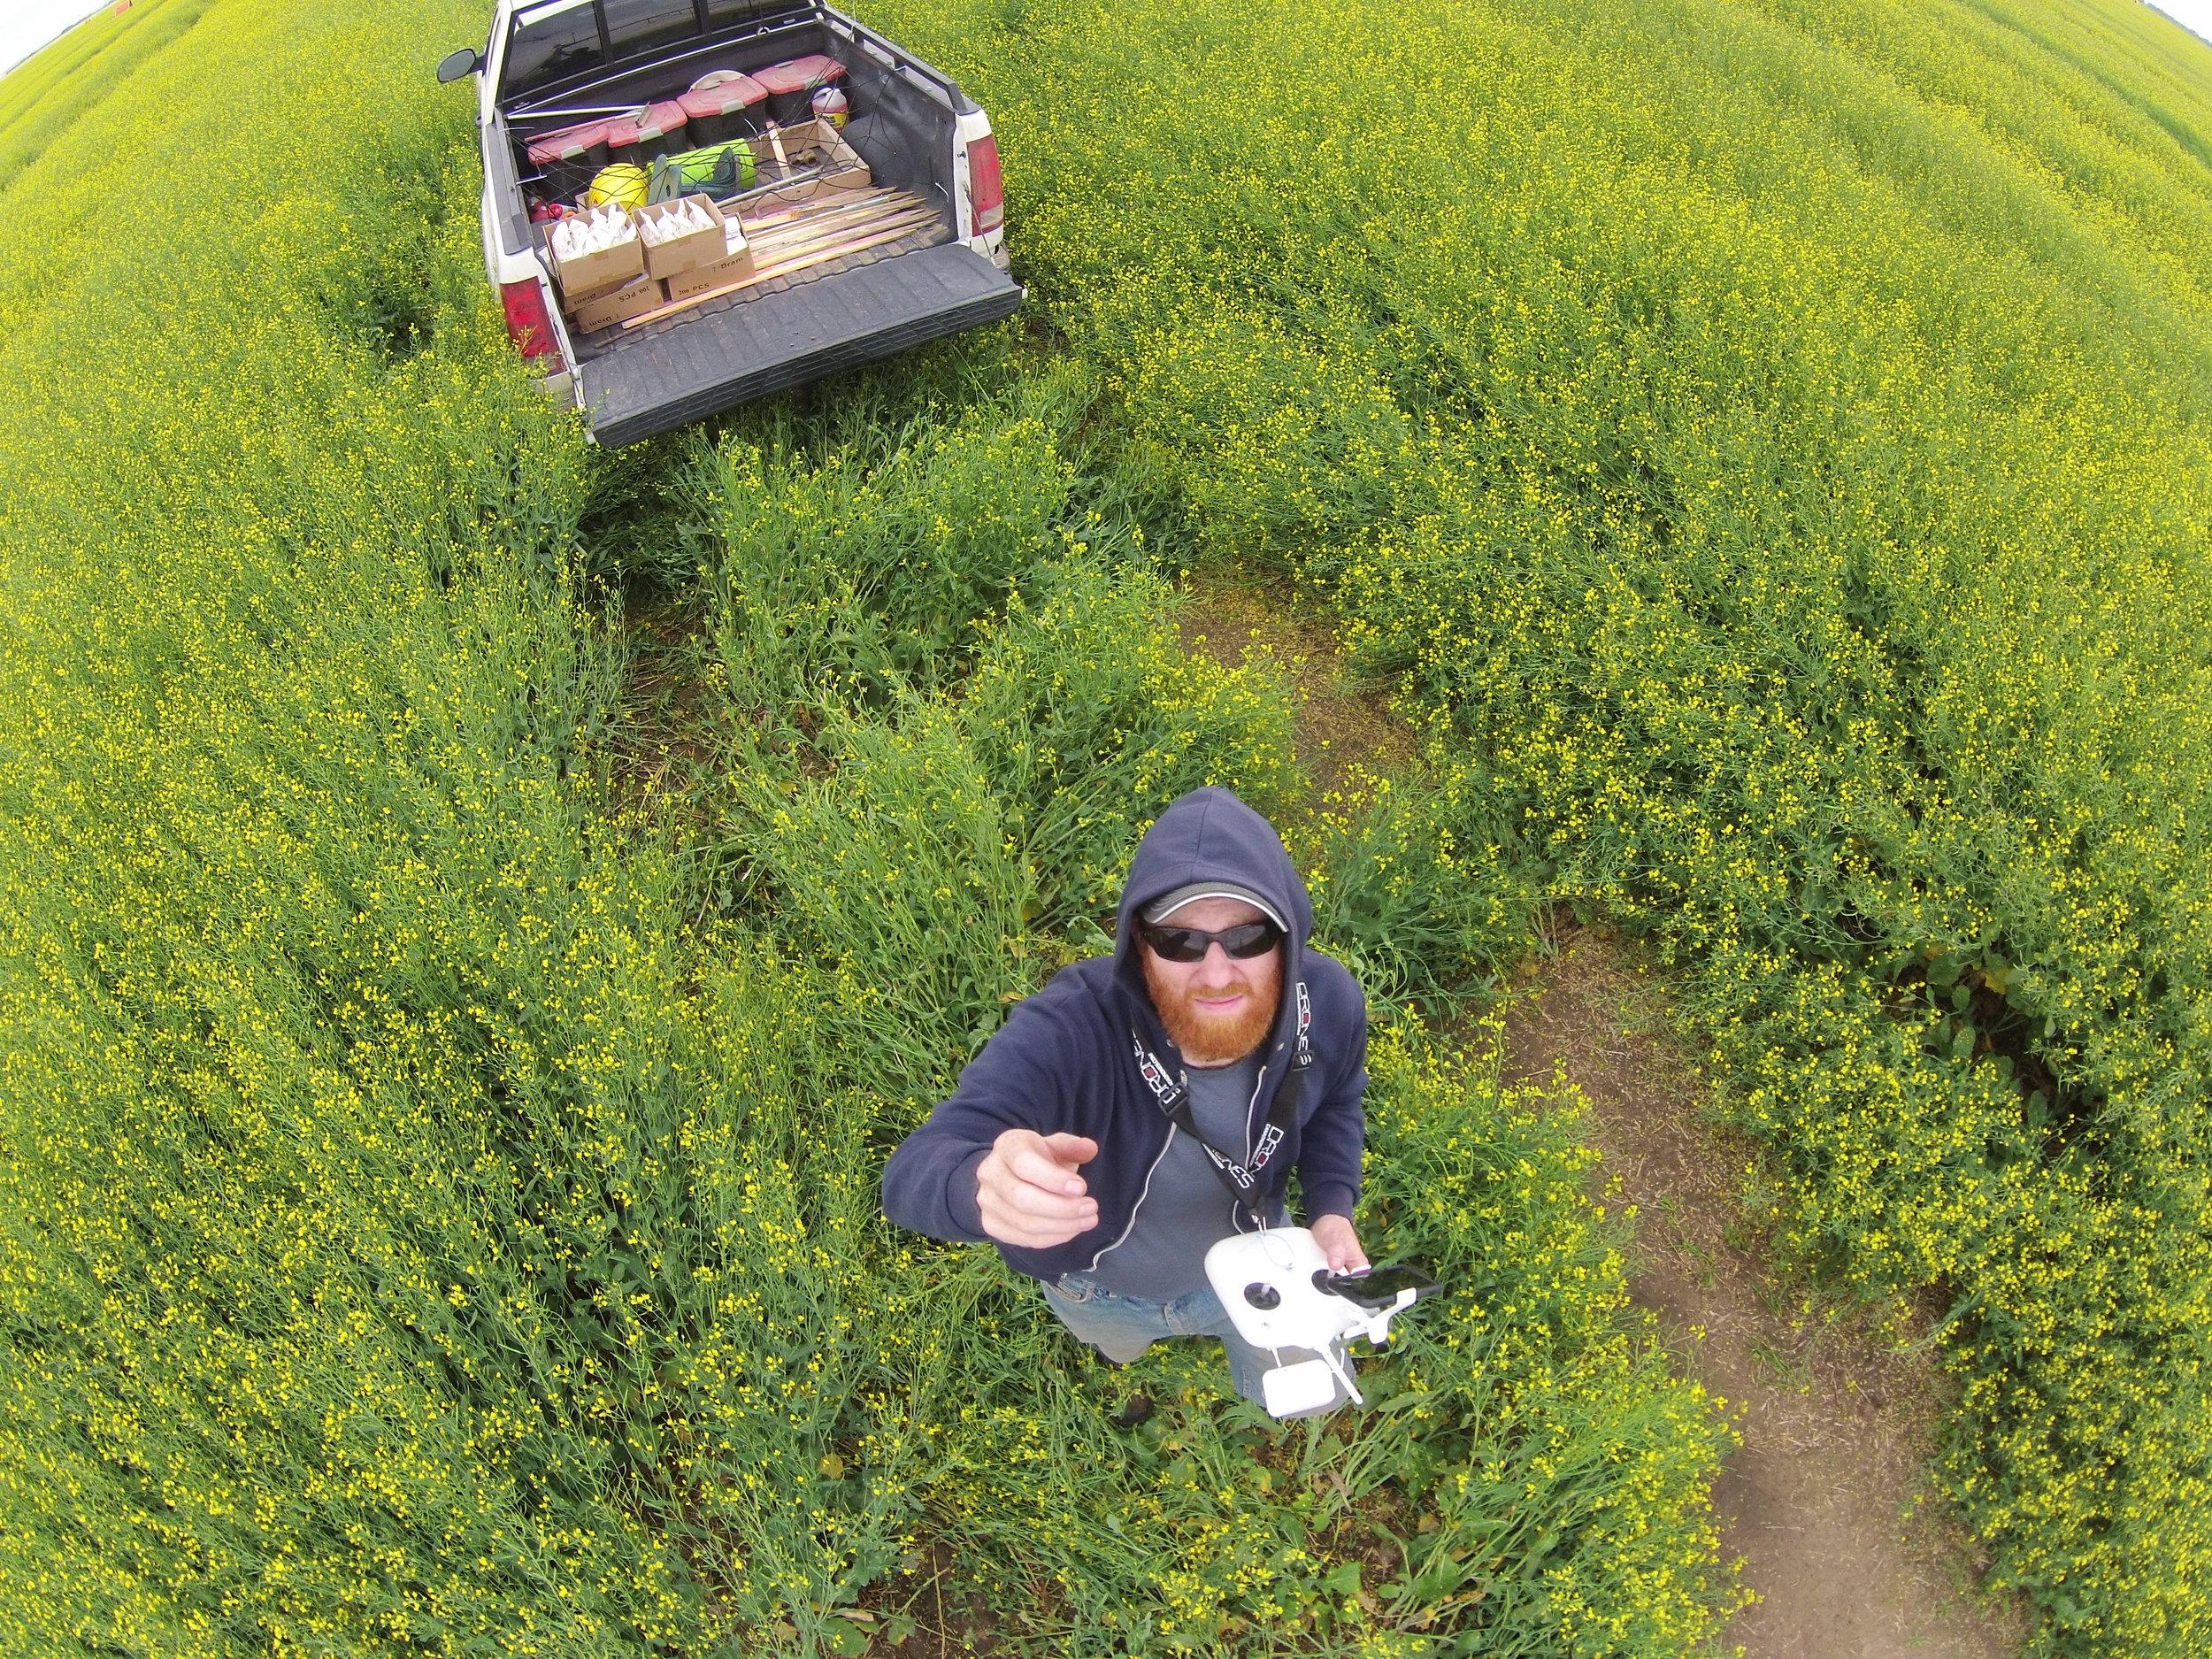 Selfie with UAV - Copy.JPG